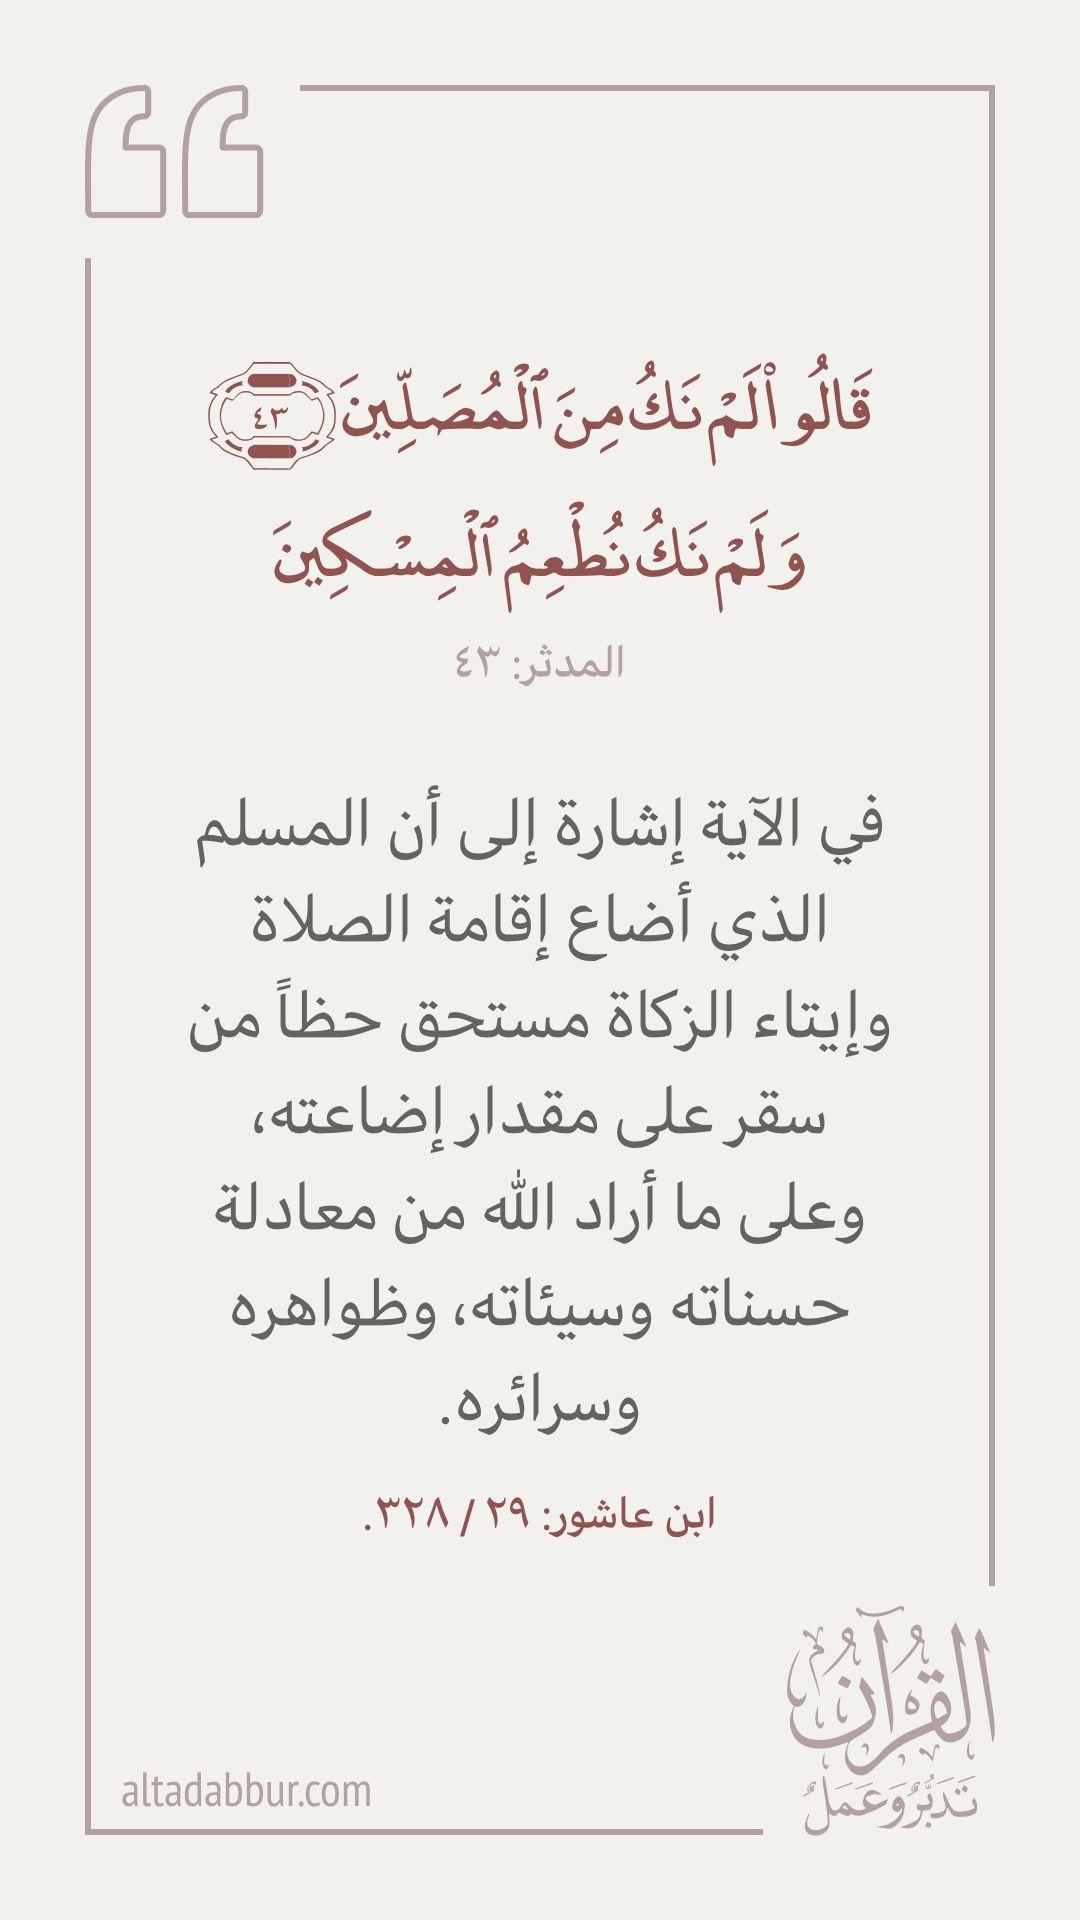 Pin By On قرآن تفسير وتدب ر Islamic Quotes Islamic Messages Islamic Teachings